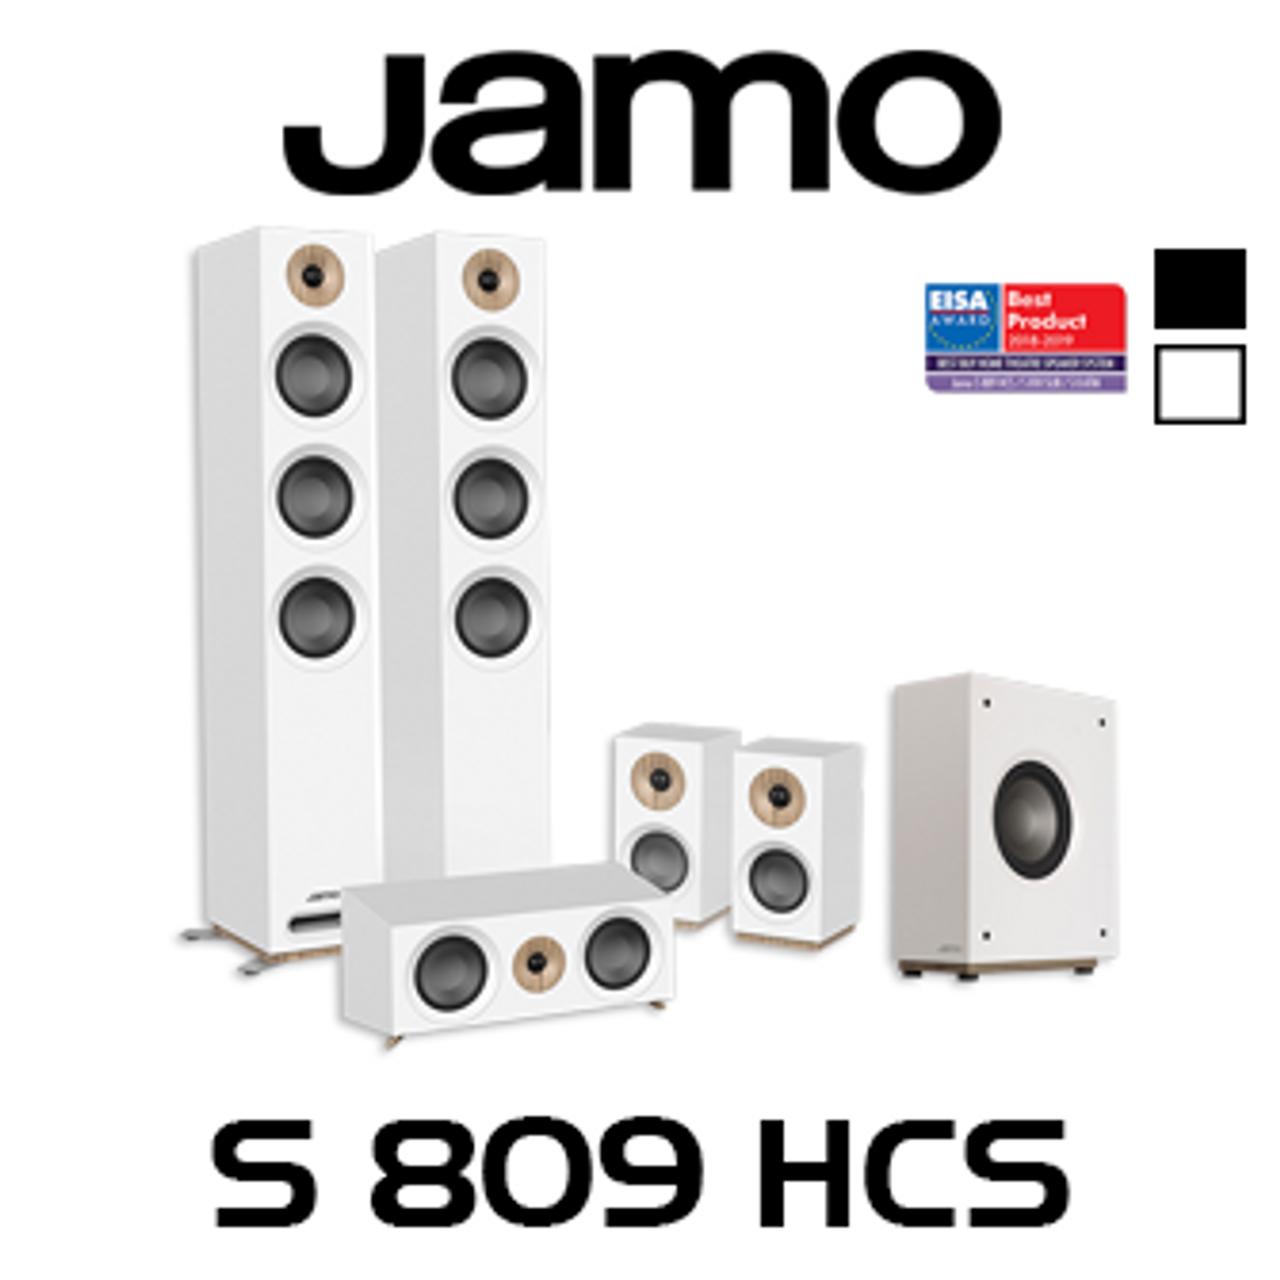 Jamo S809 HCS 5 1 Home Cinema System